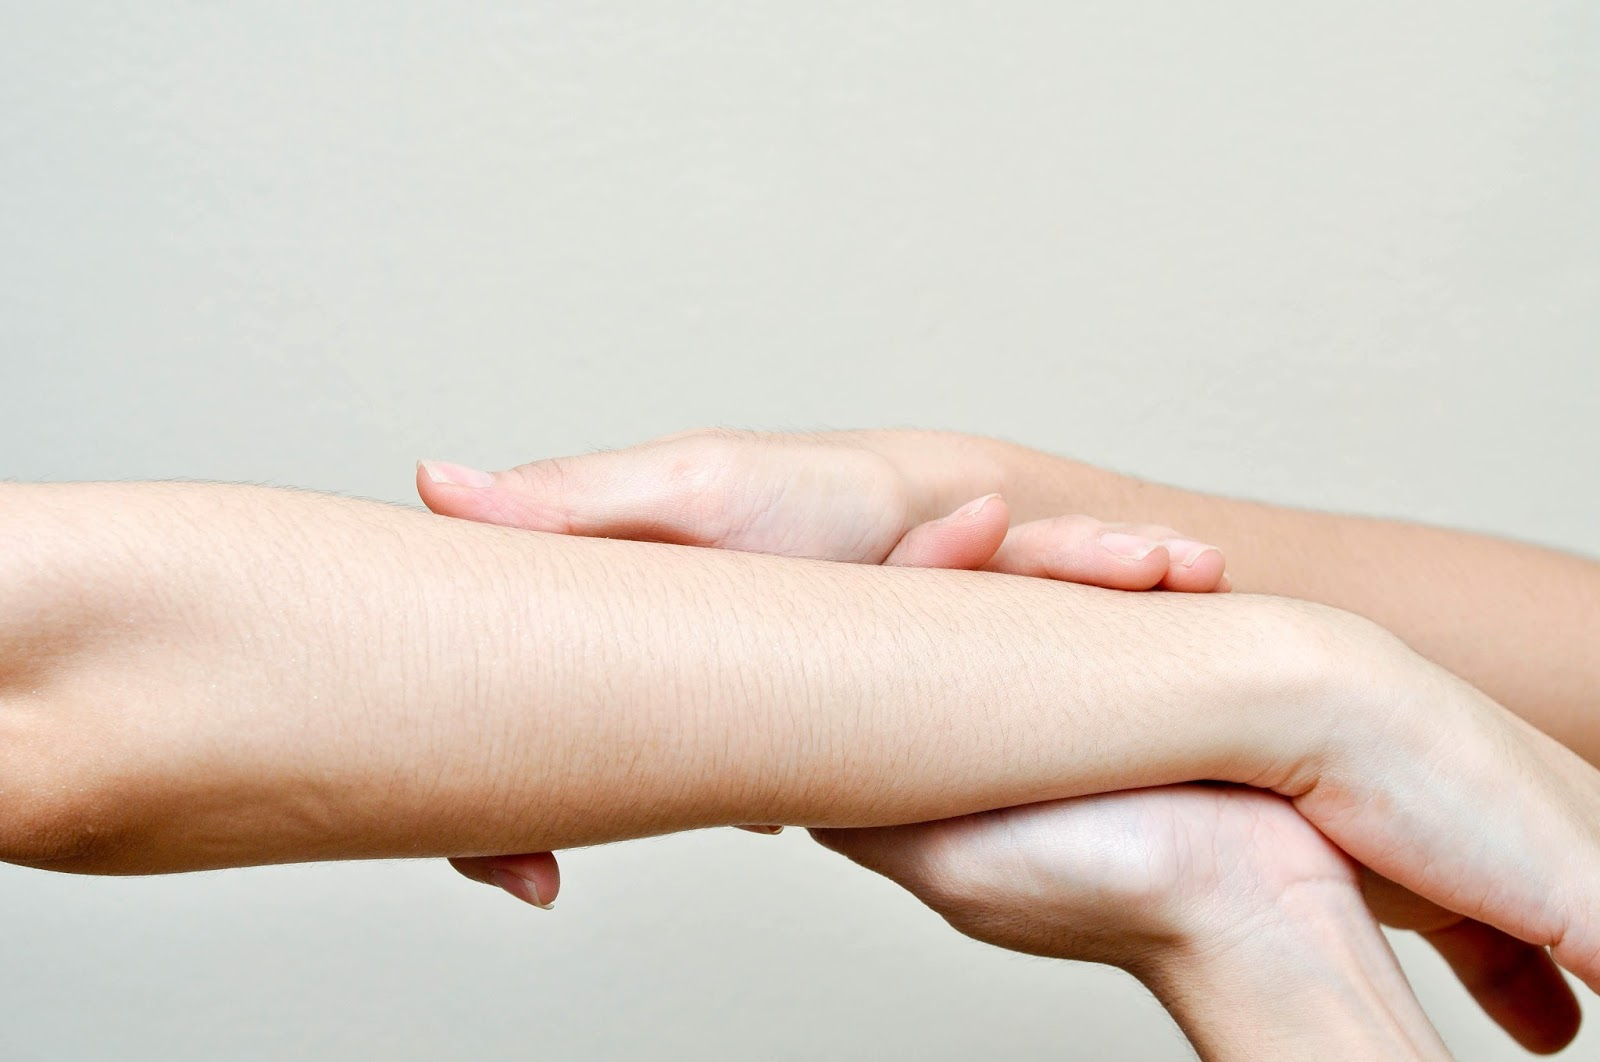 Menjadi anggun ialah dambaan dari semua perempuan di seluruh dunia Cara Memutihkan Kulit Wajah, Tangan, dan Kaki Secara Alami